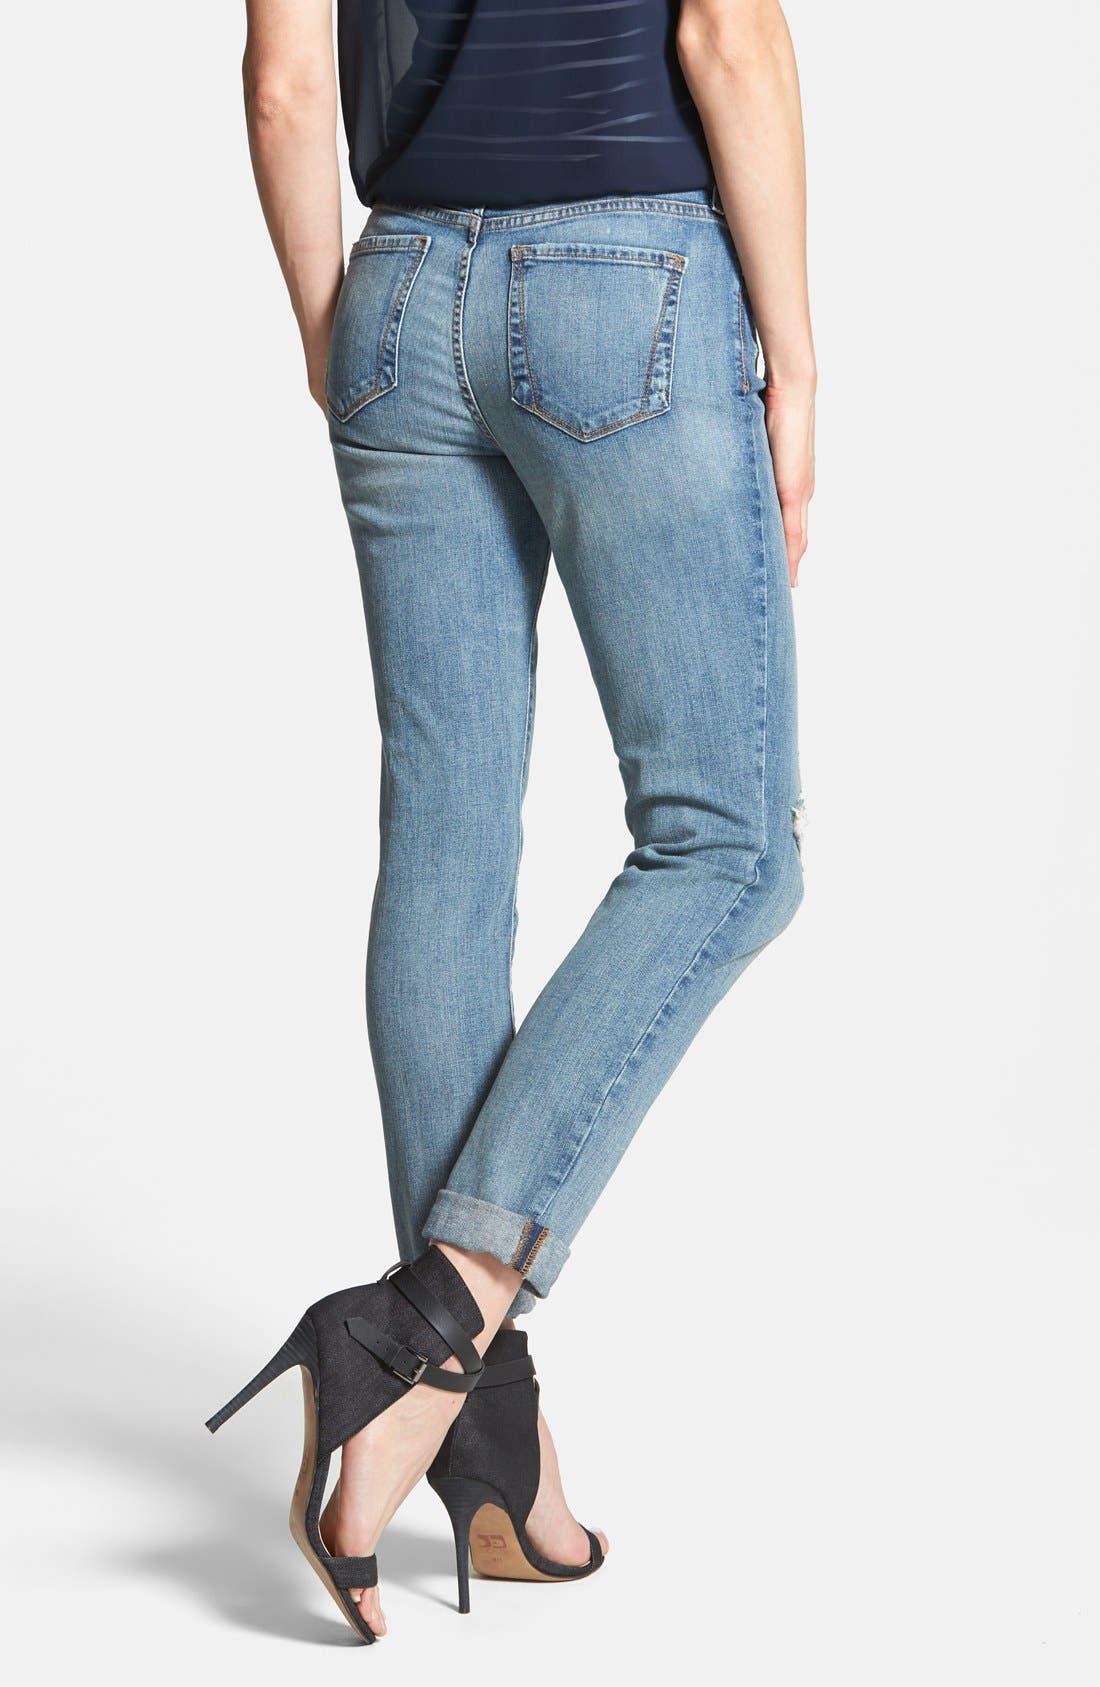 Alternate Image 2  - NYDJ 'Anabelle' Distressed Stretch Skinny Ankle Jeans (Lake Havasu) (Regular & Petite)